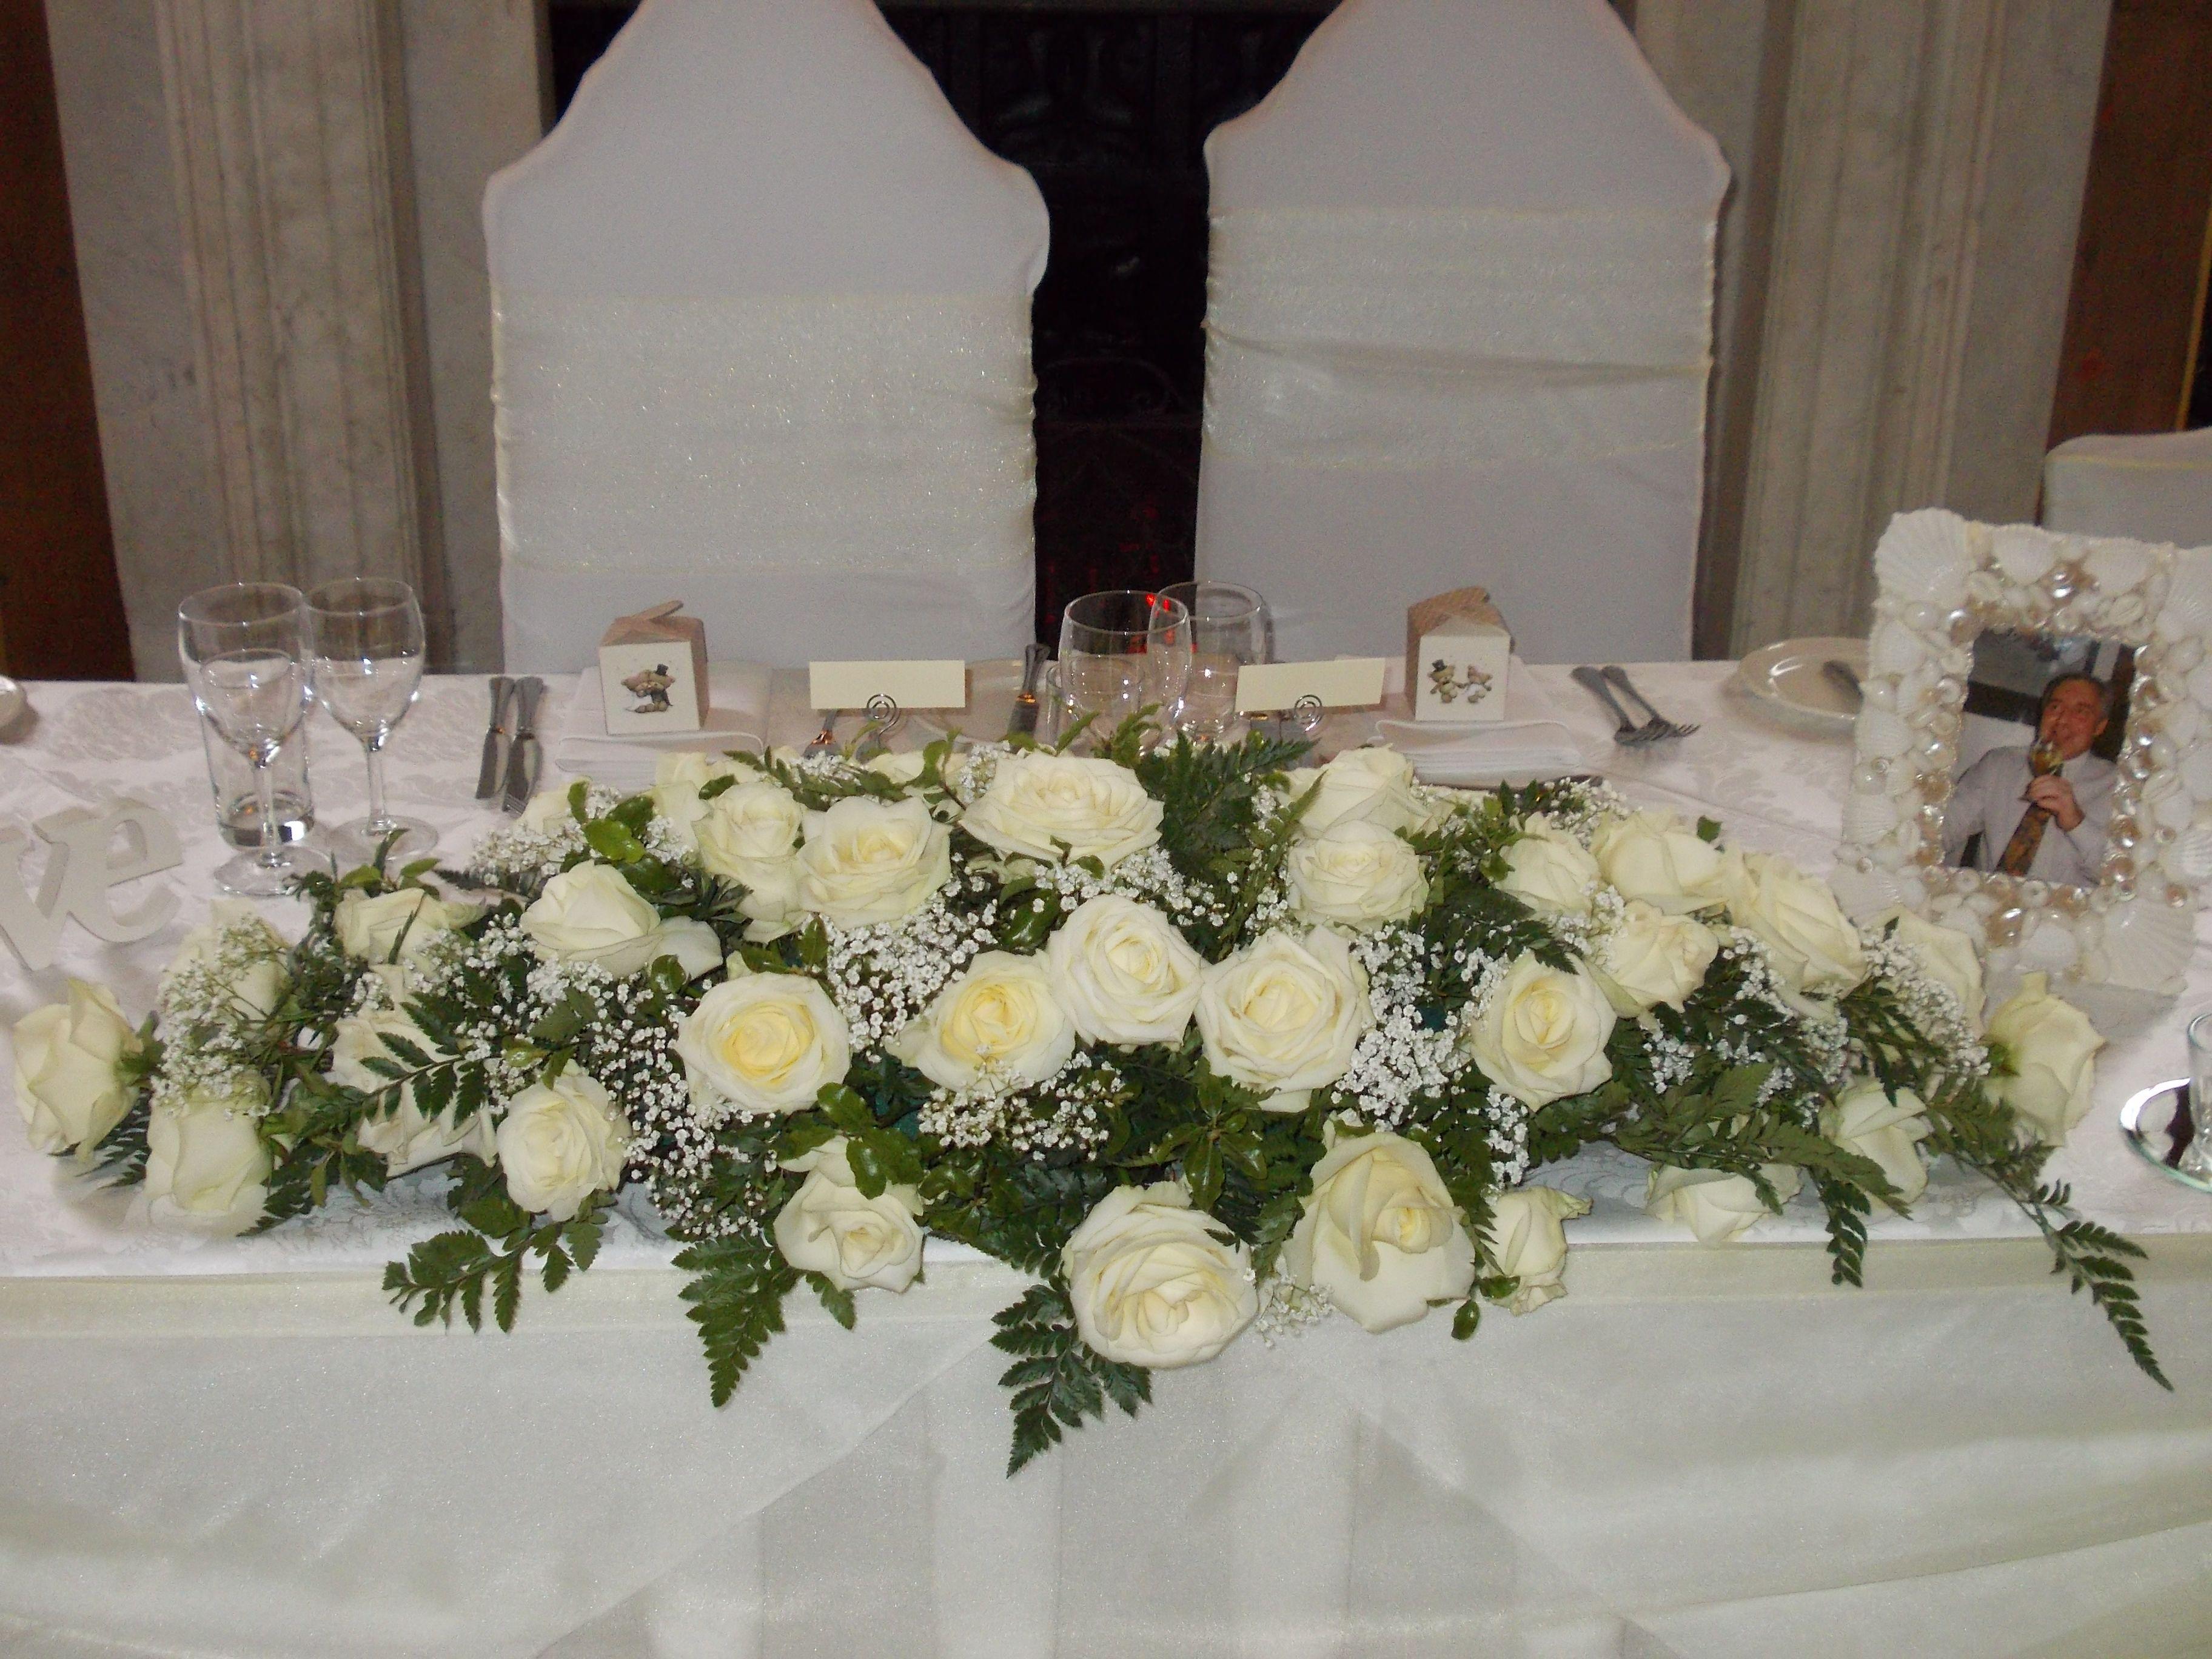 top table flower arrangement in the Ballroom